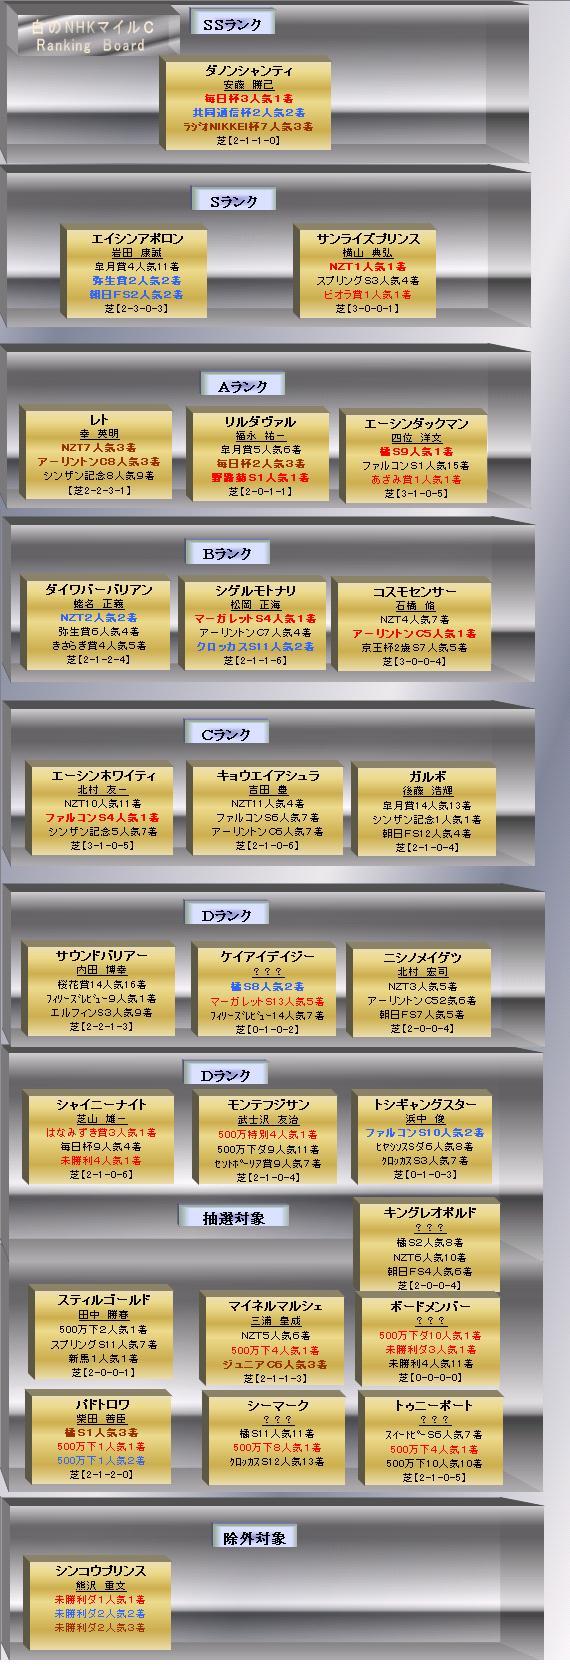 NHKRB.jpg